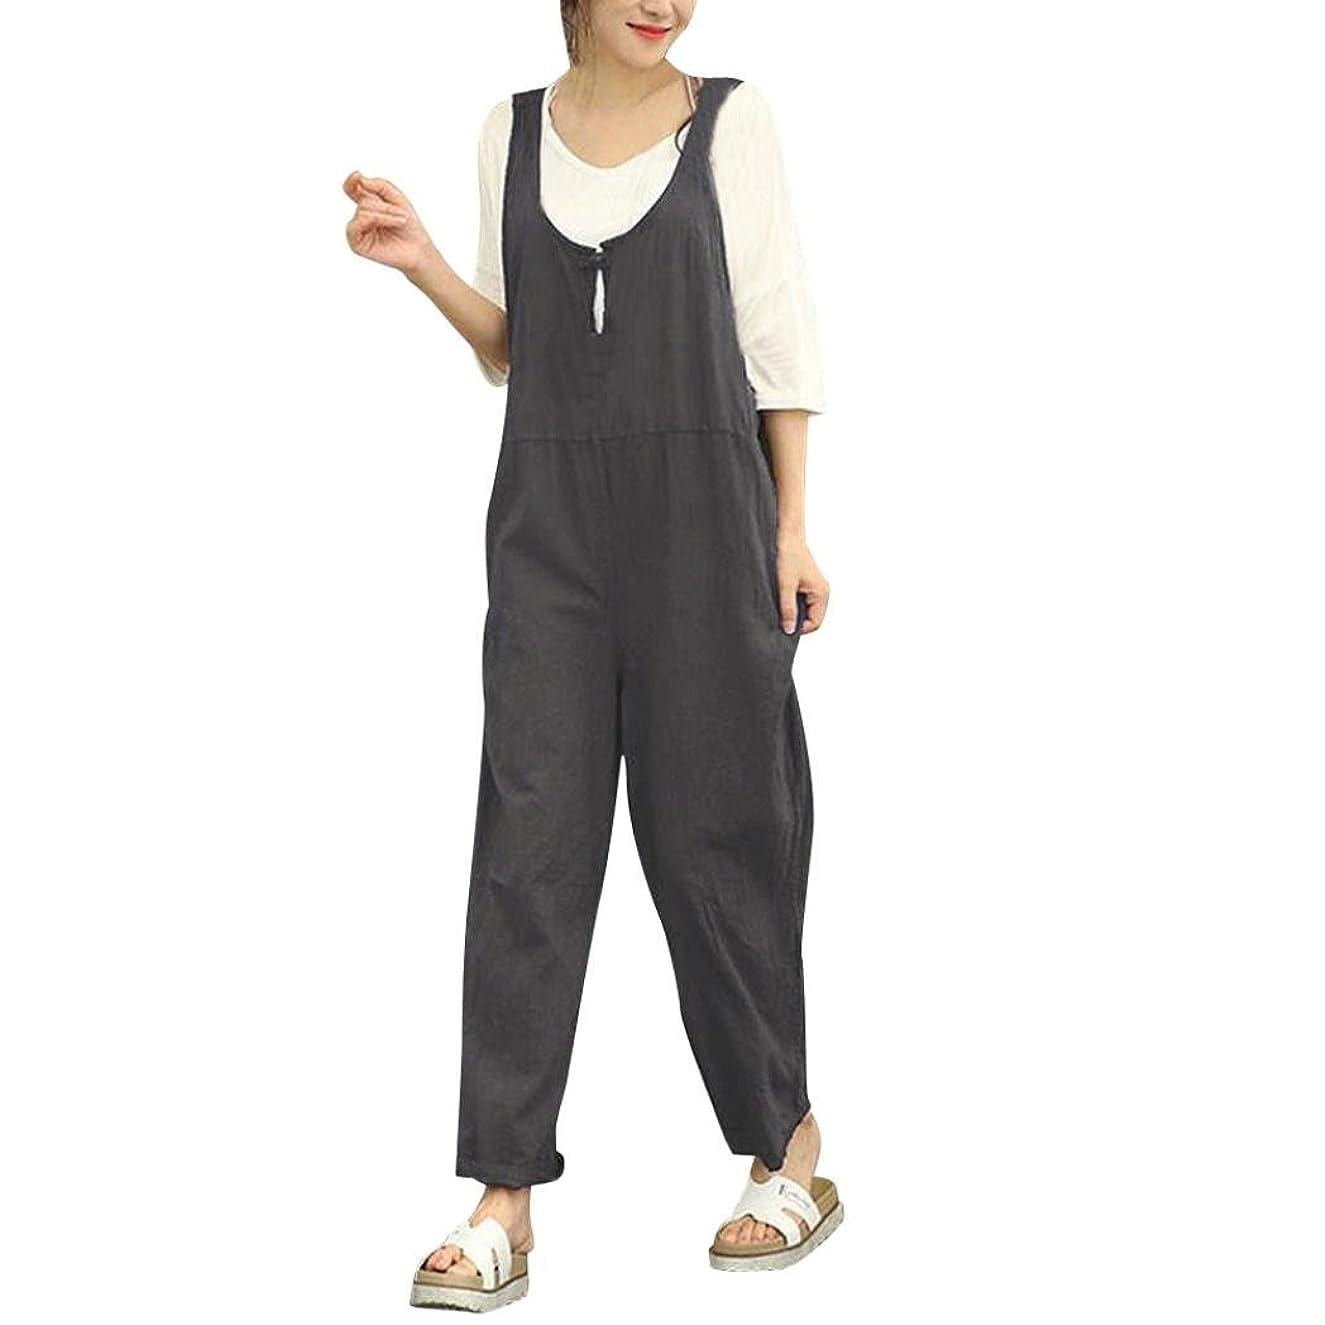 Jushye Women's Dungarees,Sleeveless Loose Cotton Long Playsuit Jumpsuit Wide Leg Pants Trousers